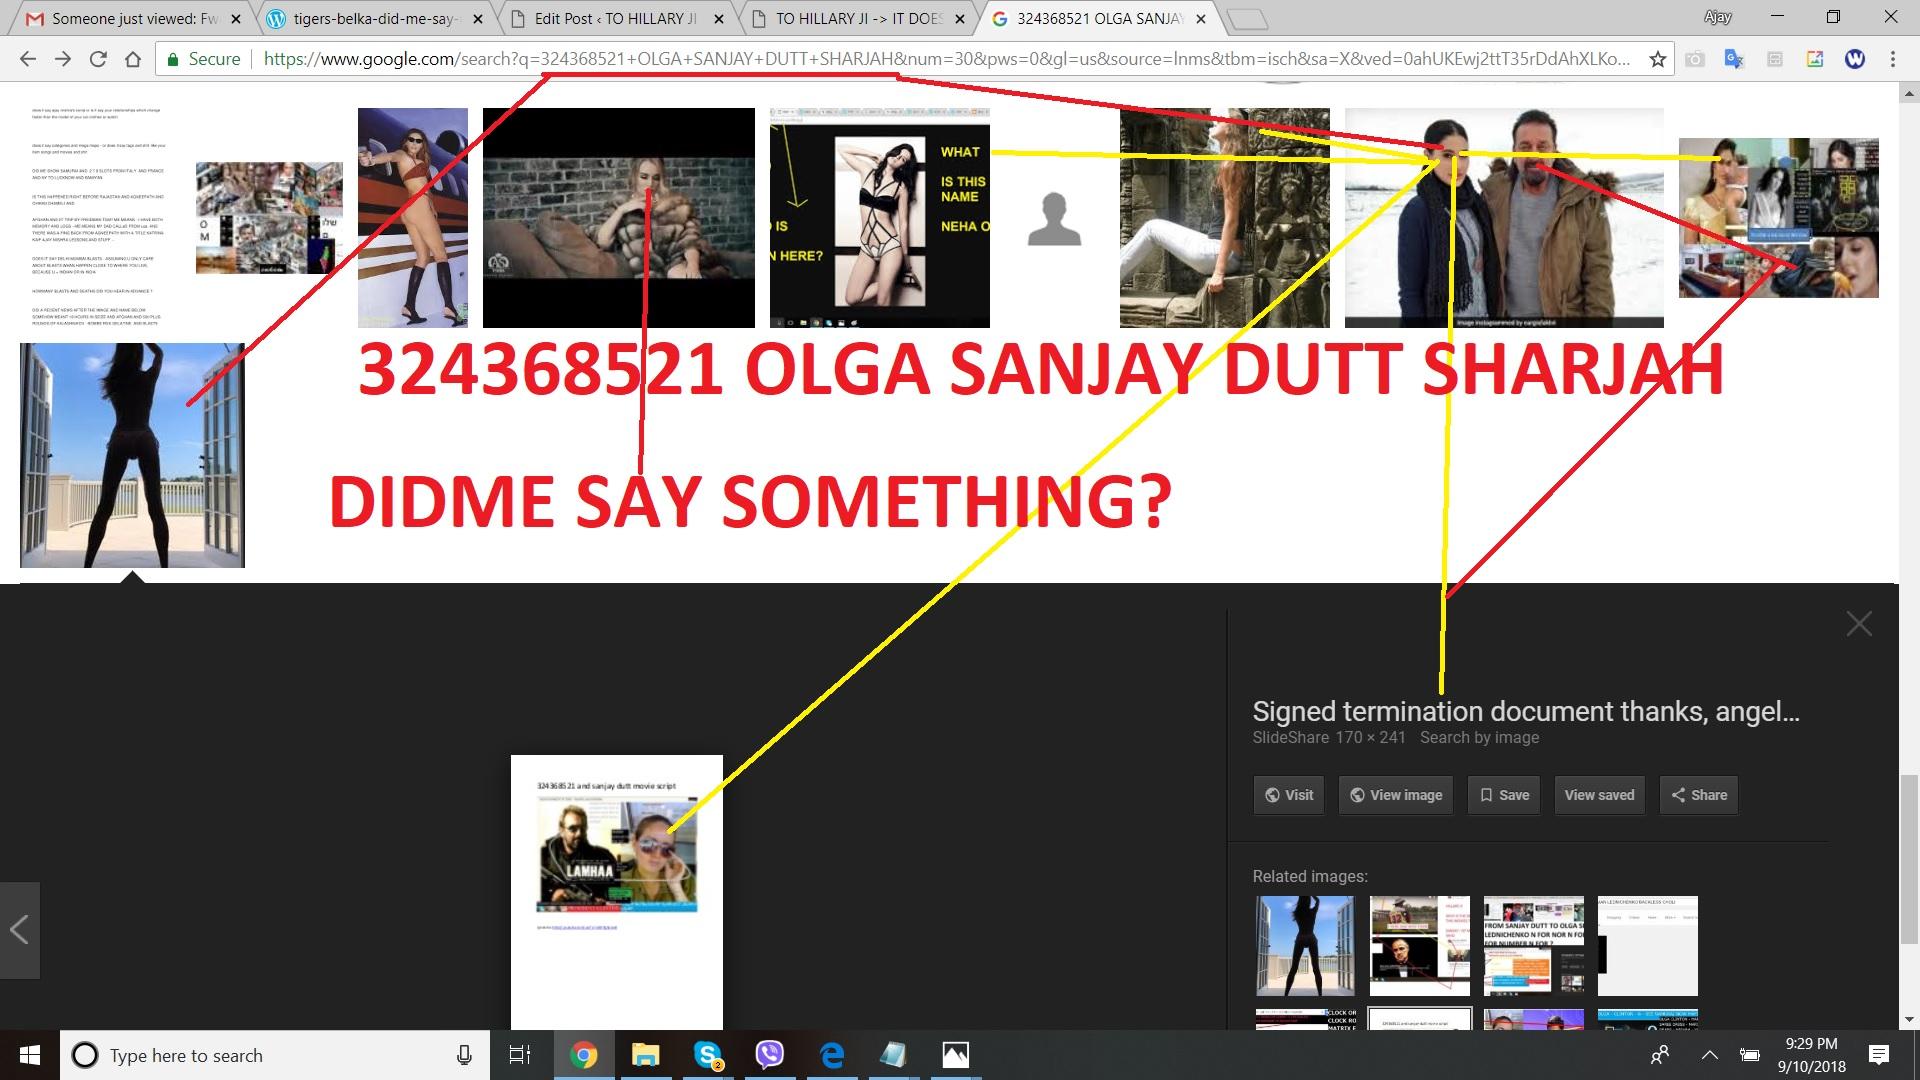 324368521 OLGA SANJAY DUTT SHARJAH